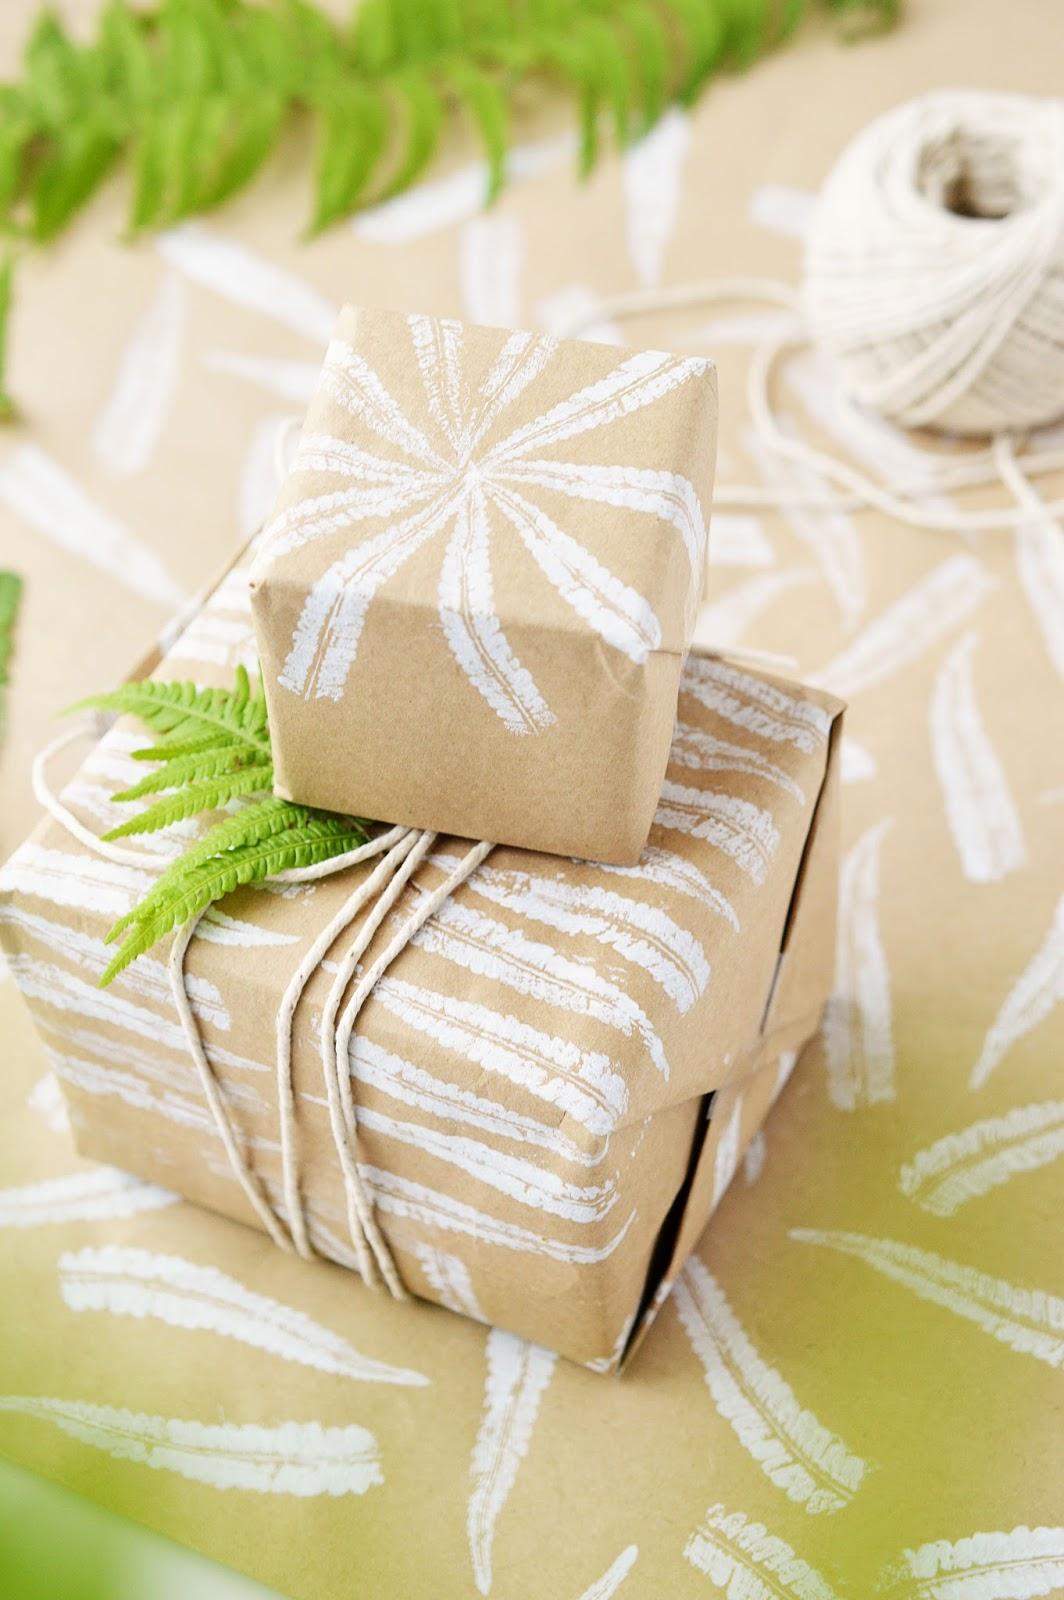 DIY Fern Stamping Gift Wrapping | Motte's Blog